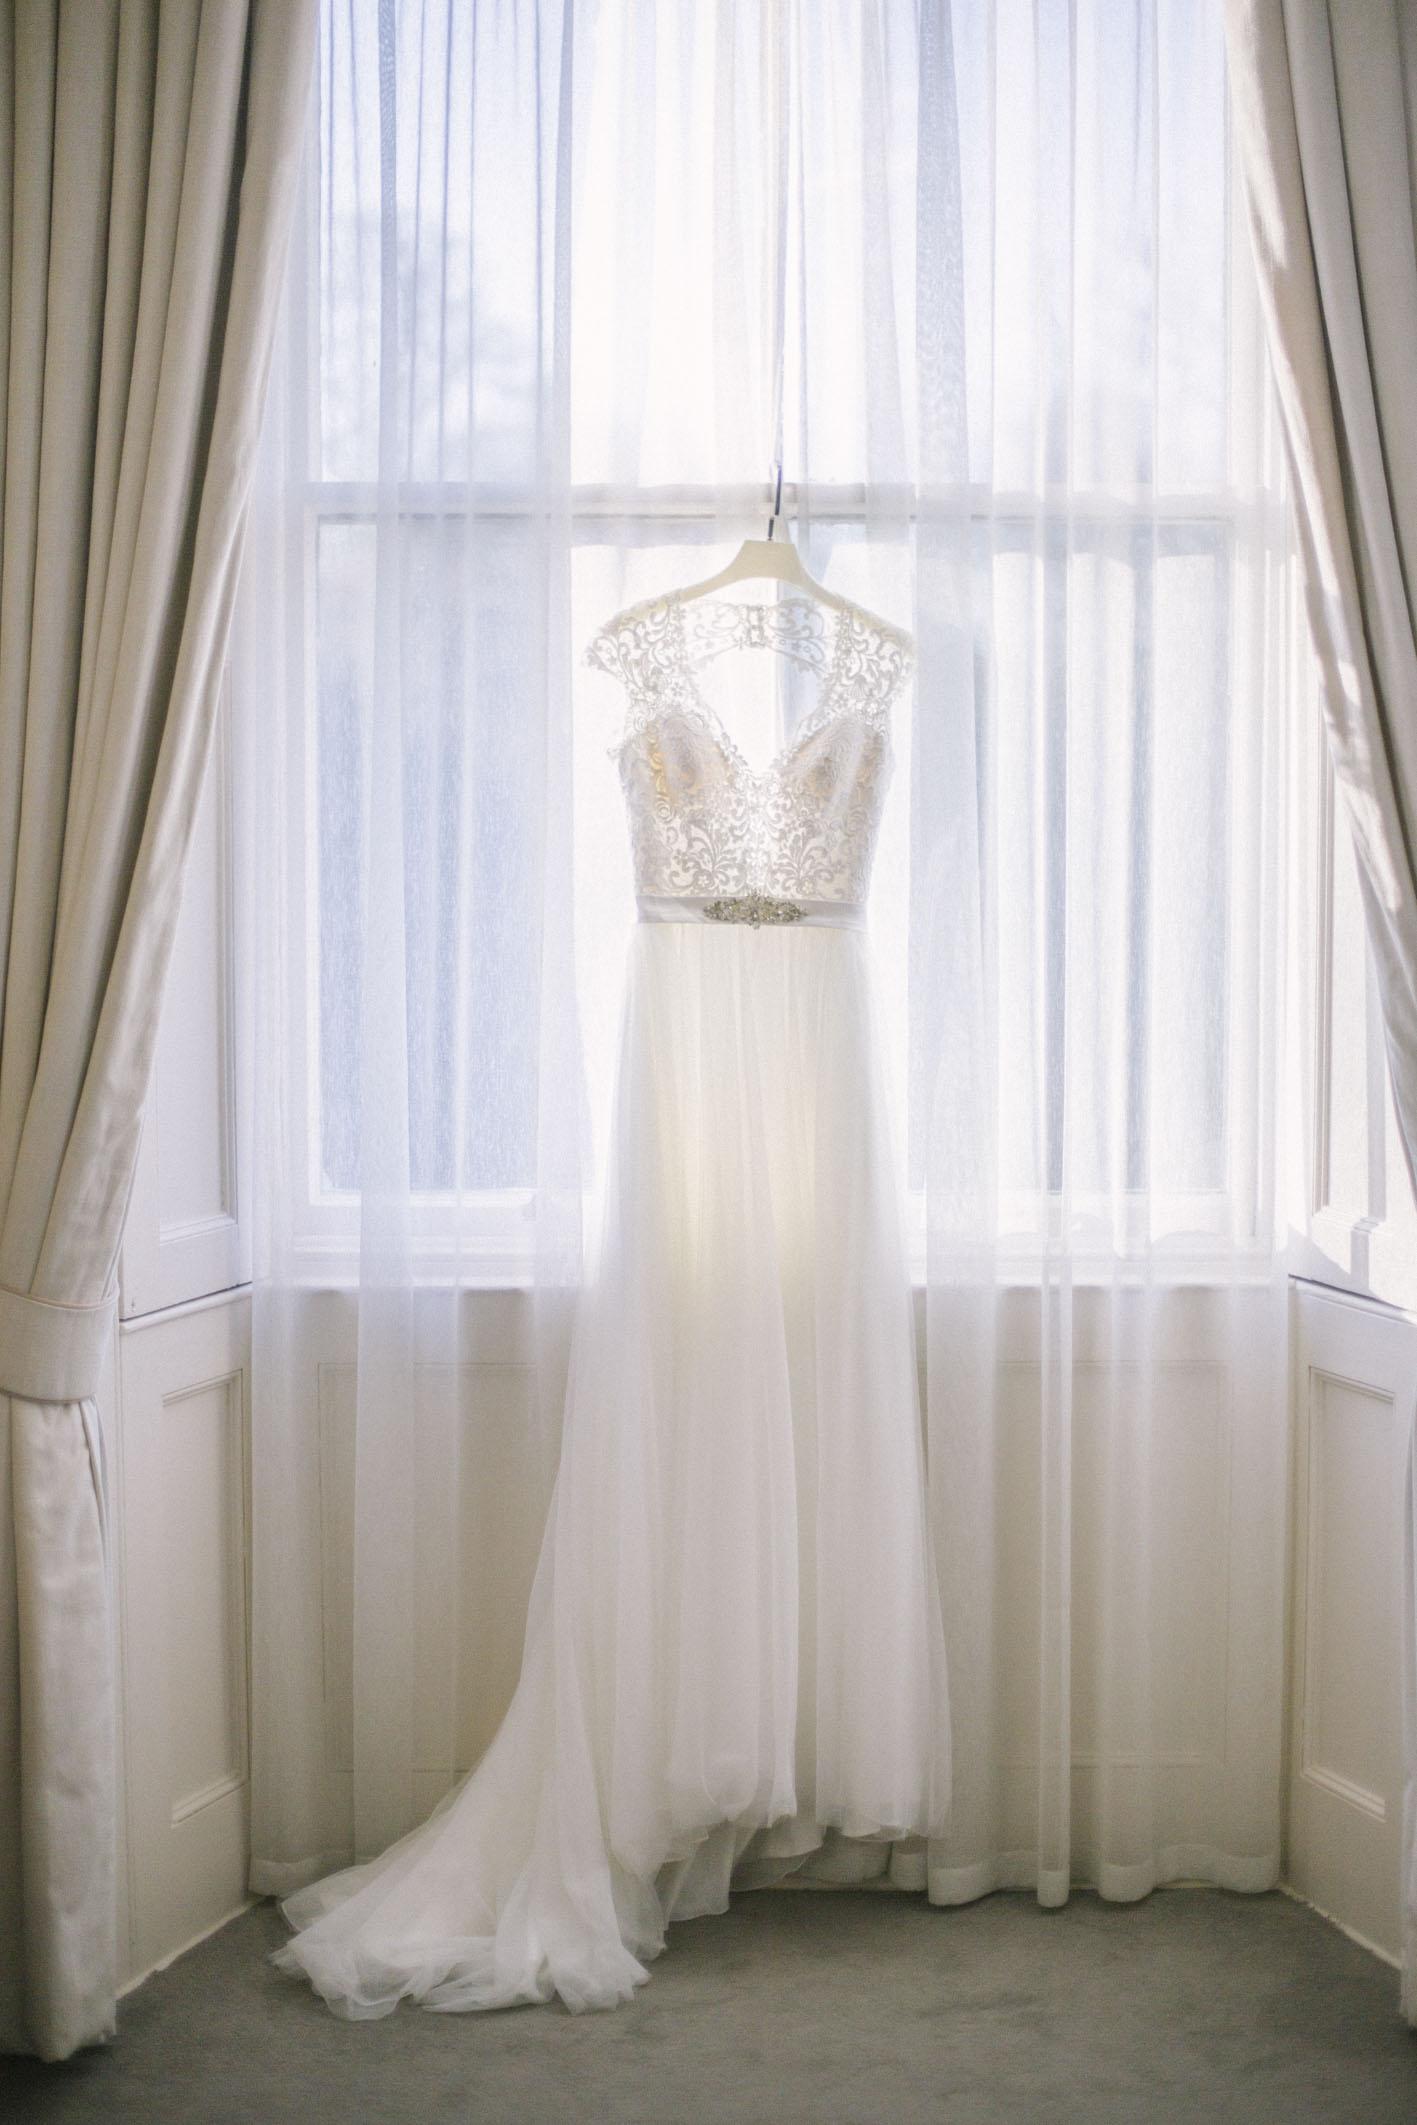 Elegant Winter wedding at Balbirnie House captured by Edinburgh Wedding Photographer Ceranna Photography